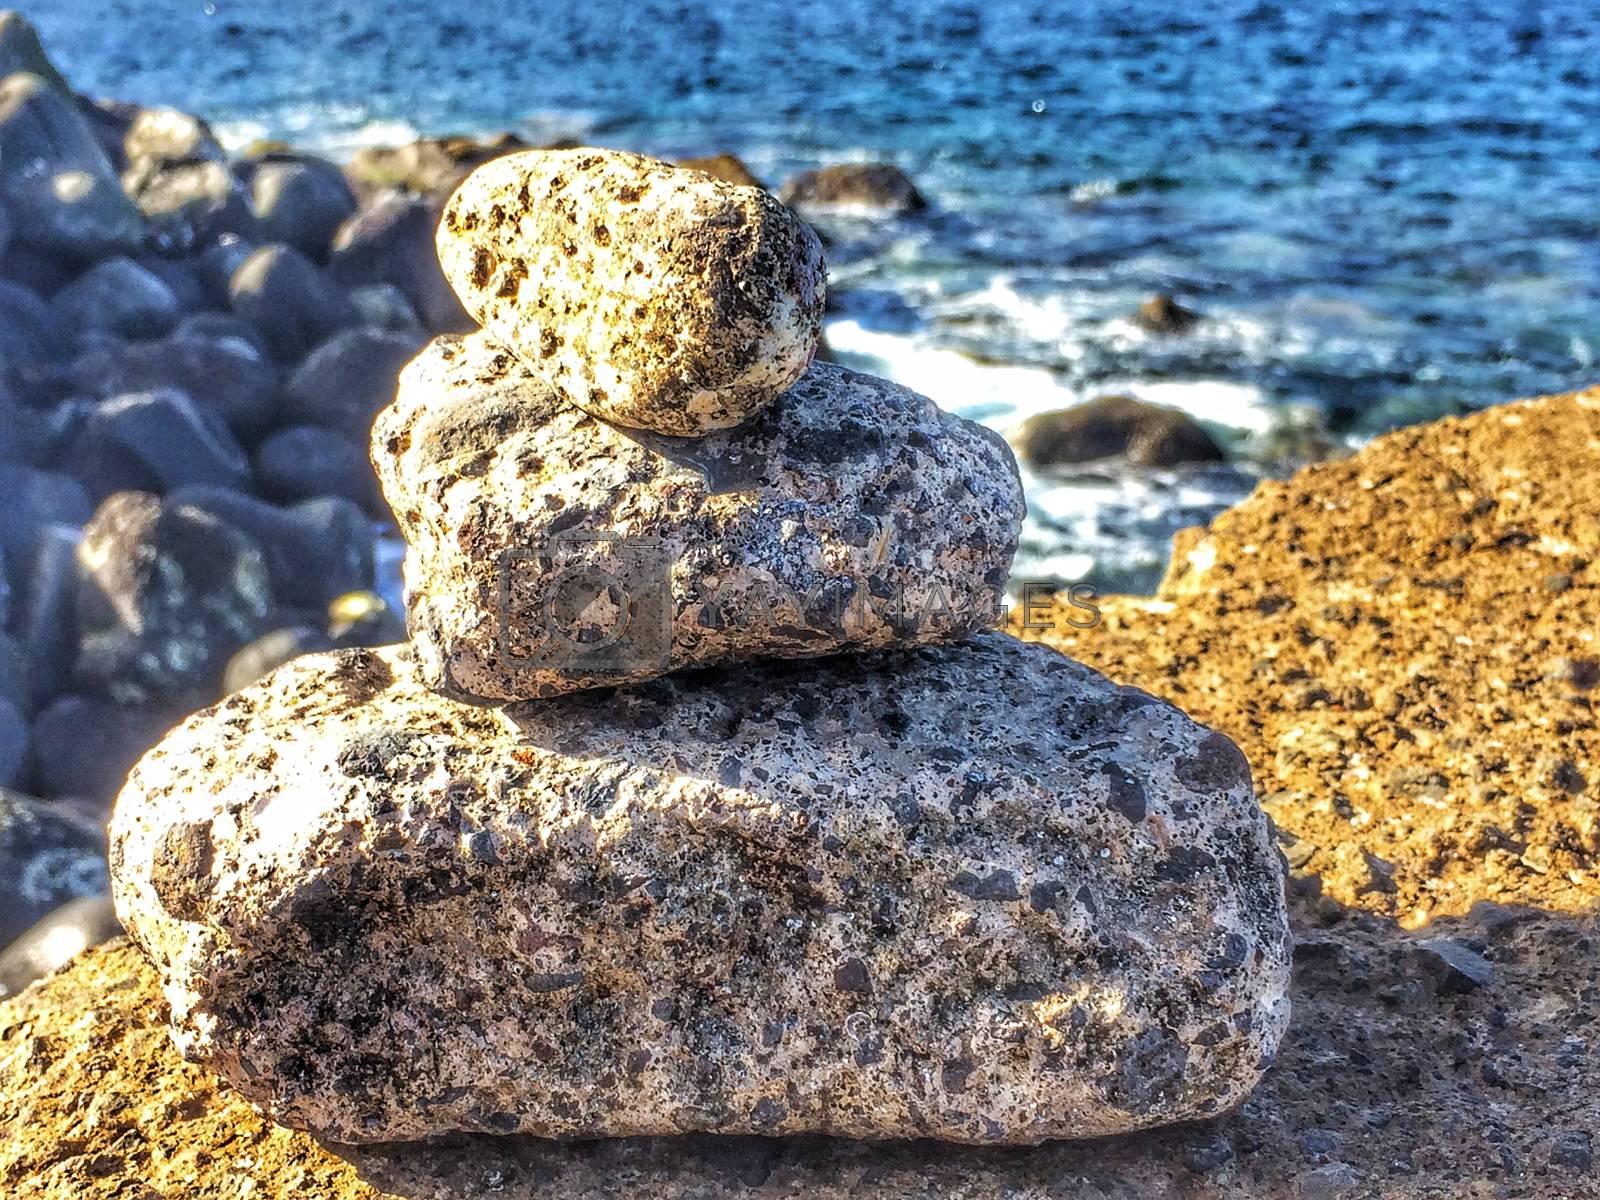 Zen stones on a rock near the atlantic ocean by bremse